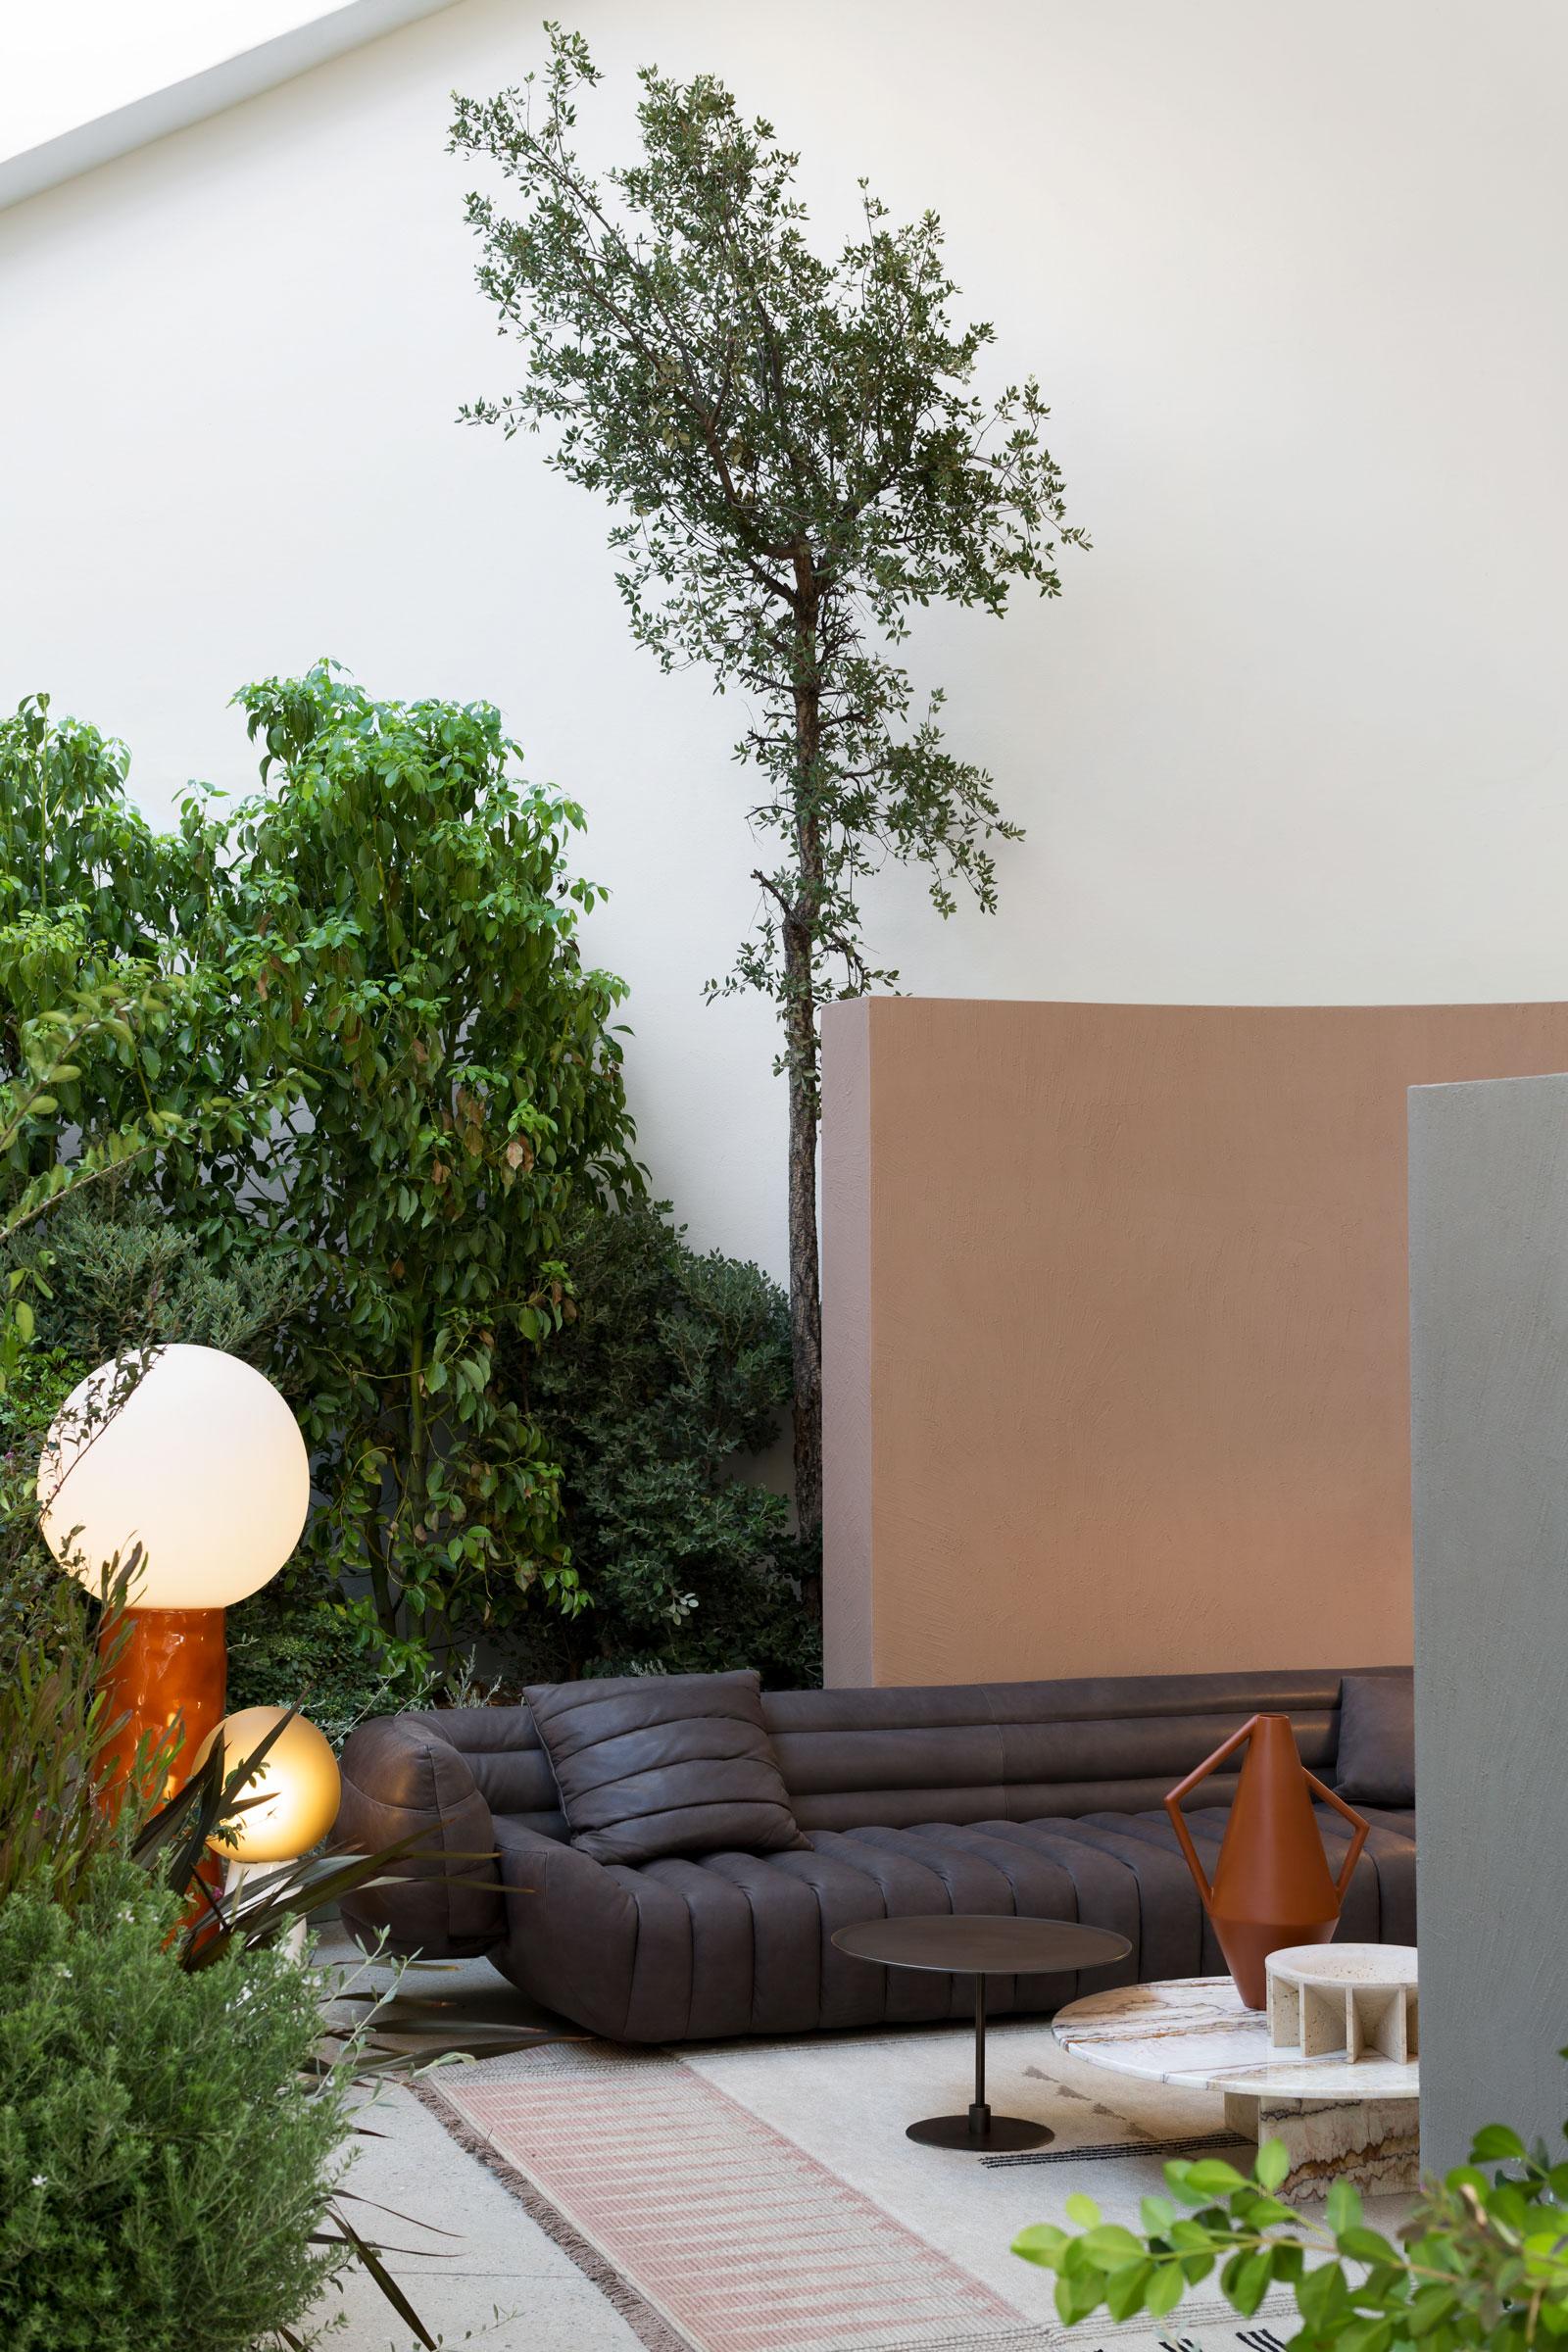 Mohd Studiopepe Milan Design Week 2021 Phoro Silvia Rivoltella Yellowtrace 05